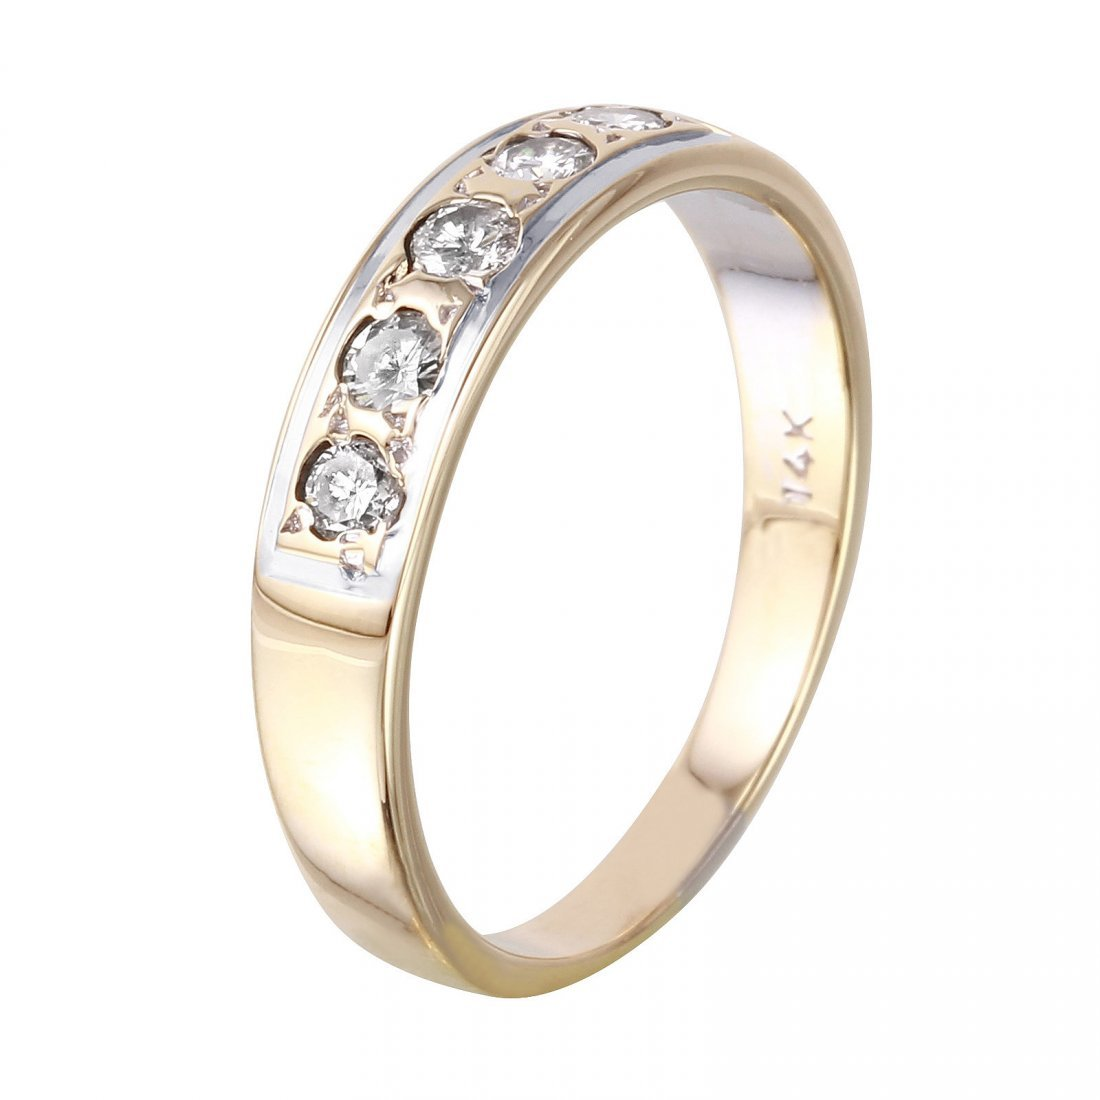 14K Yellow Gold Diamond Wedding Band, 0.3 ctw - 2